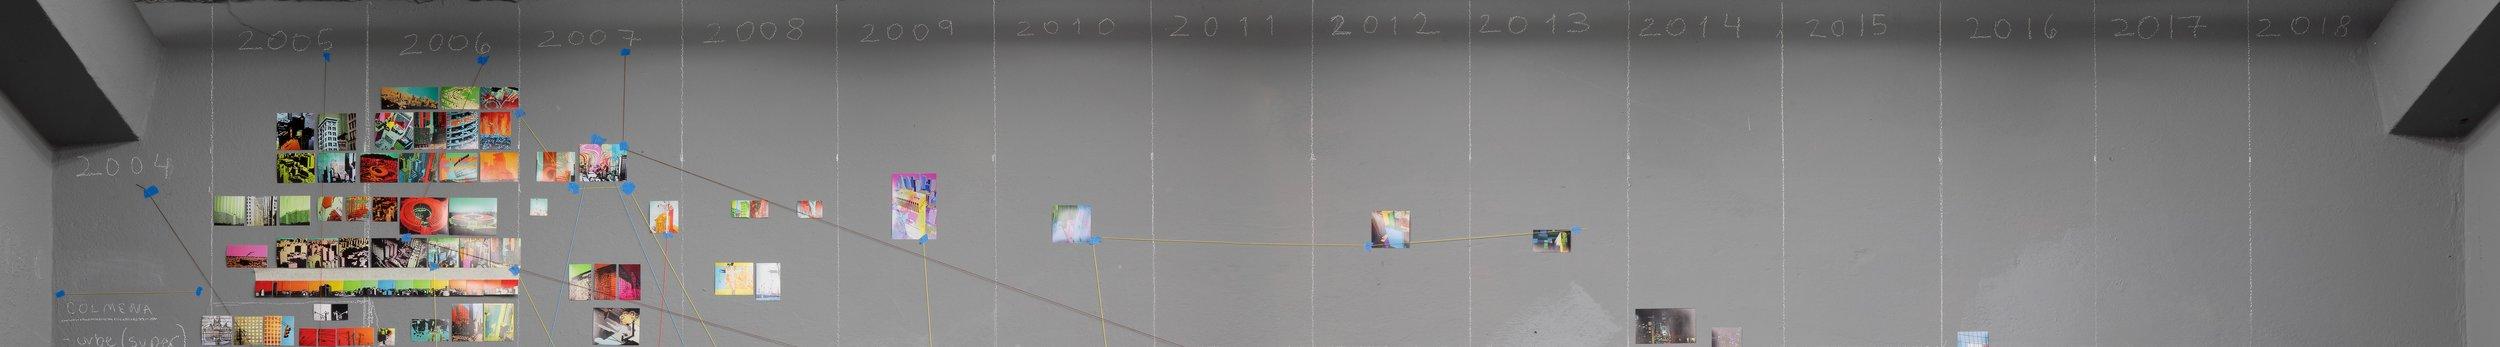 Metadata (detalle). serie: La colmena, columnas: 2004-2018 |imagen original:    roberto d'ambrosio